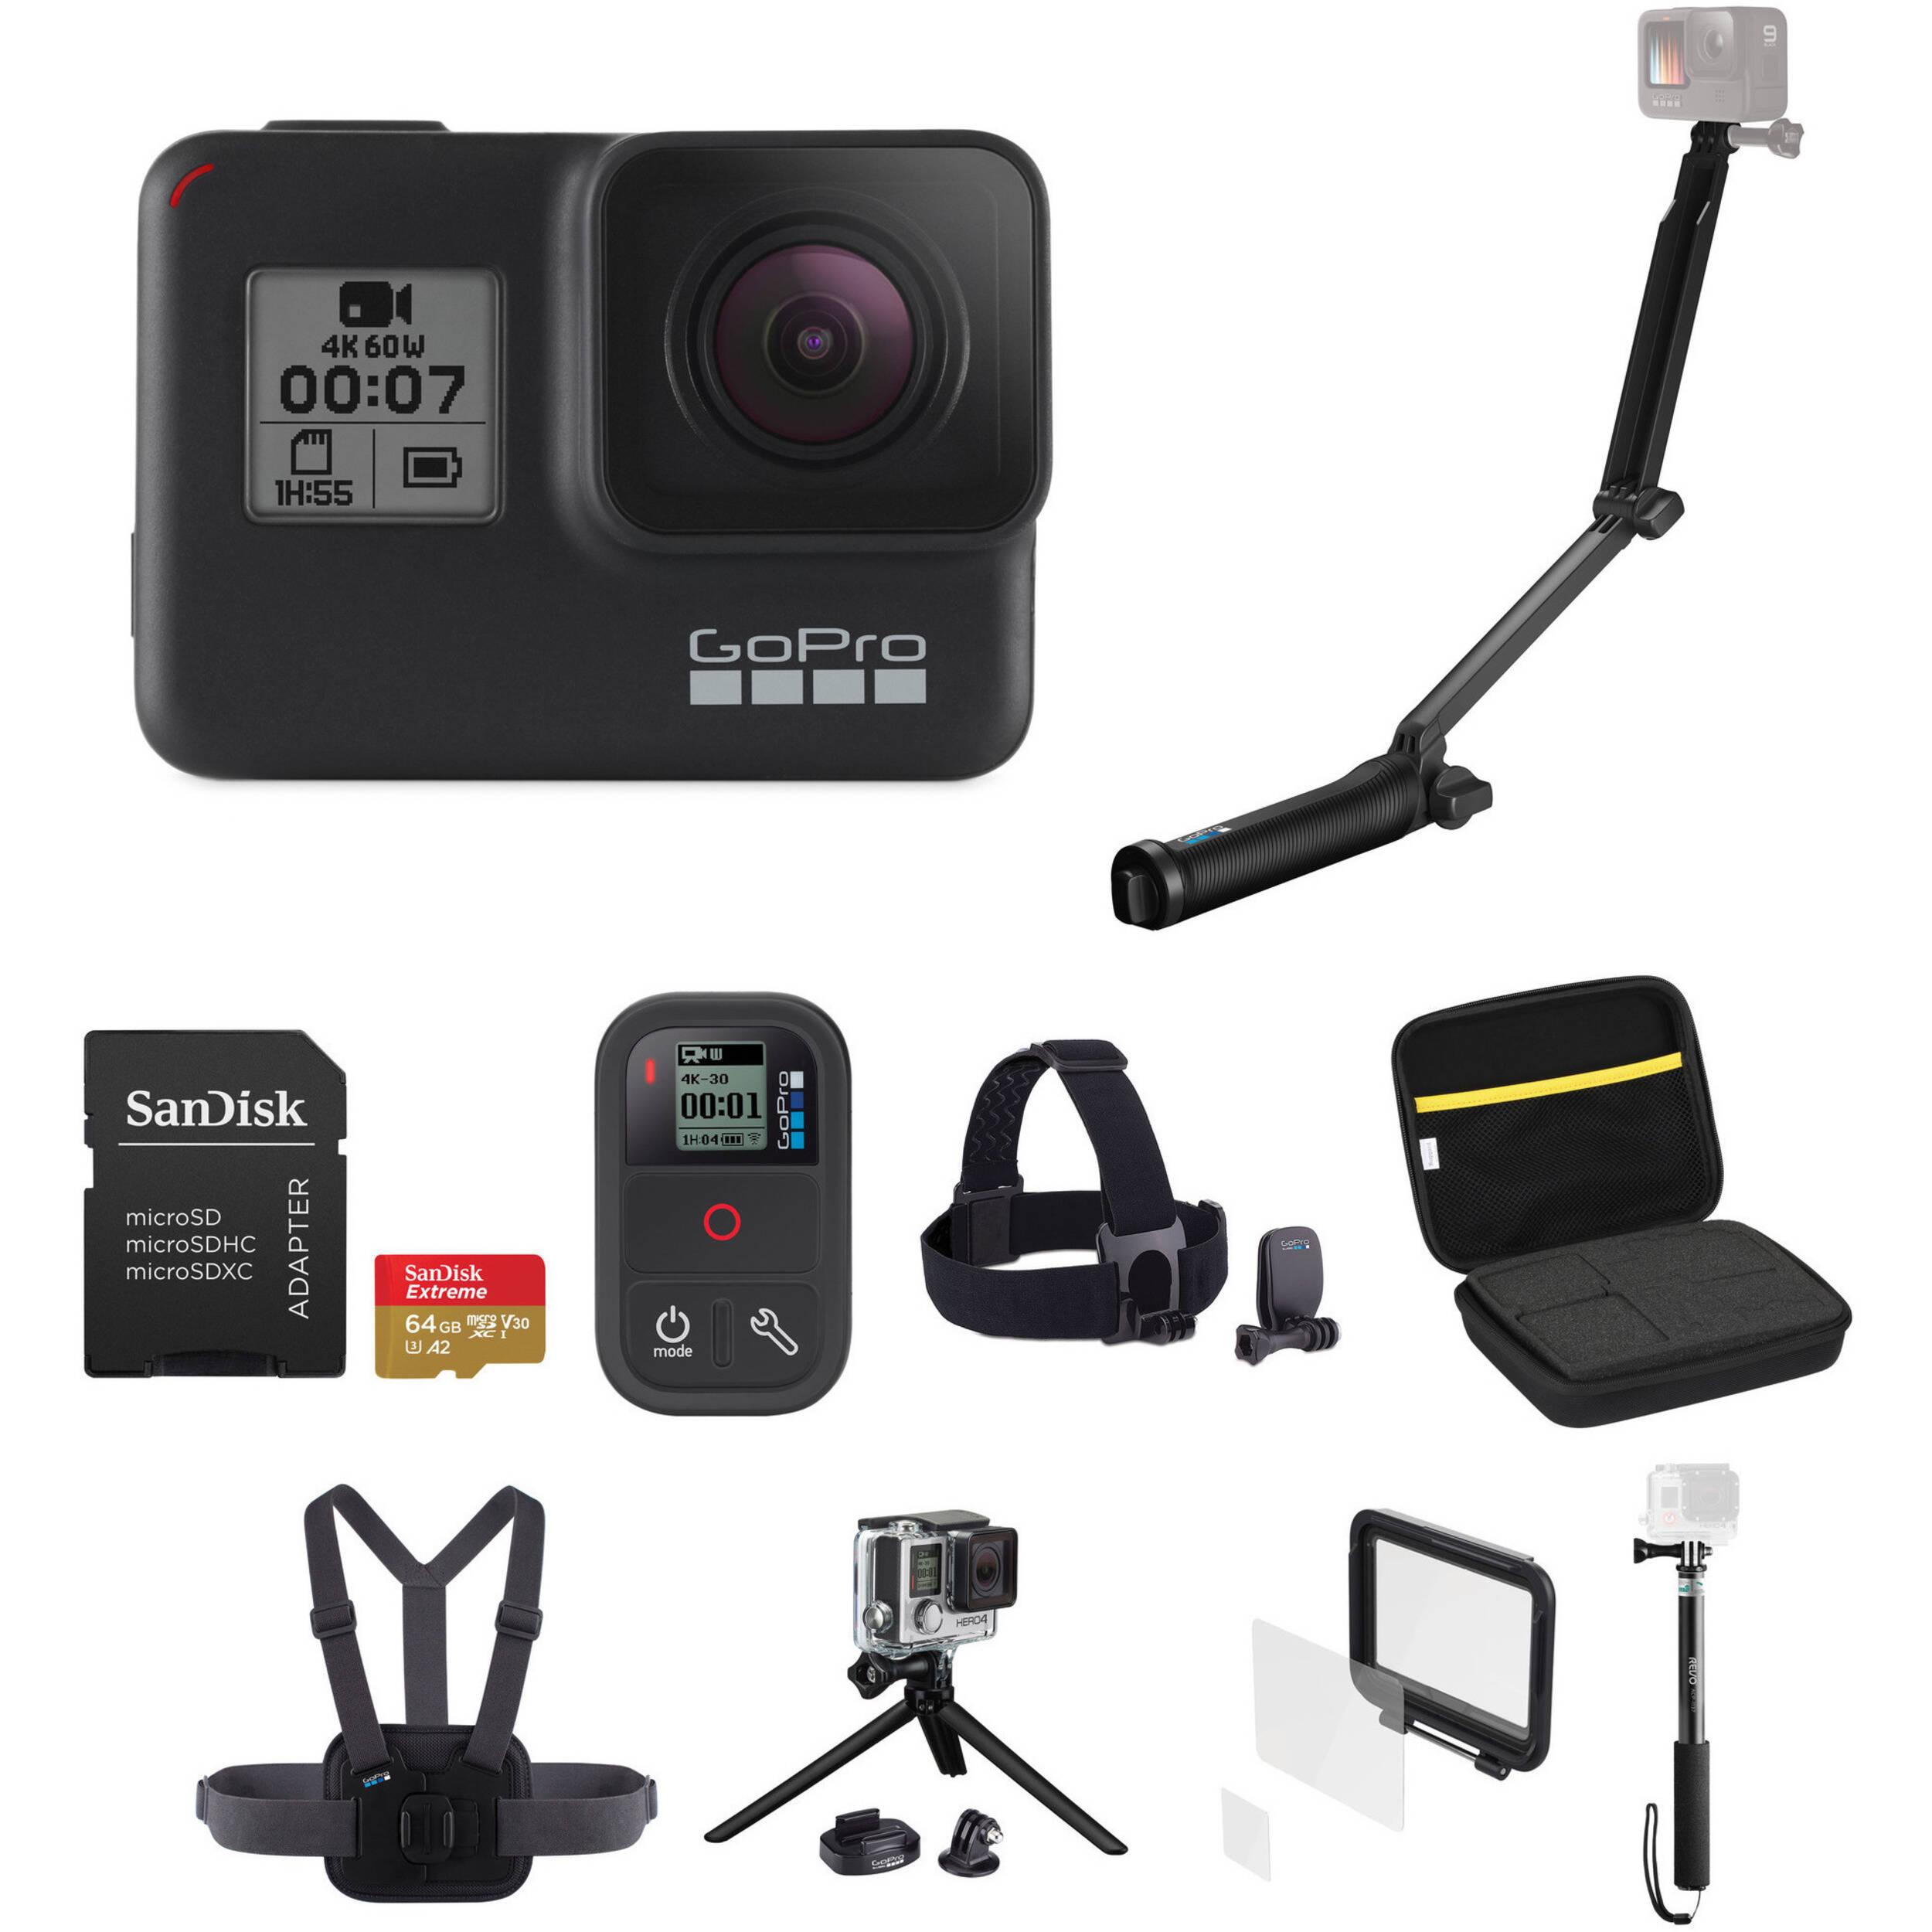 GoPro HERO7 Black /— Waterproof Digital Action Camera with Accessory Adventure Kit